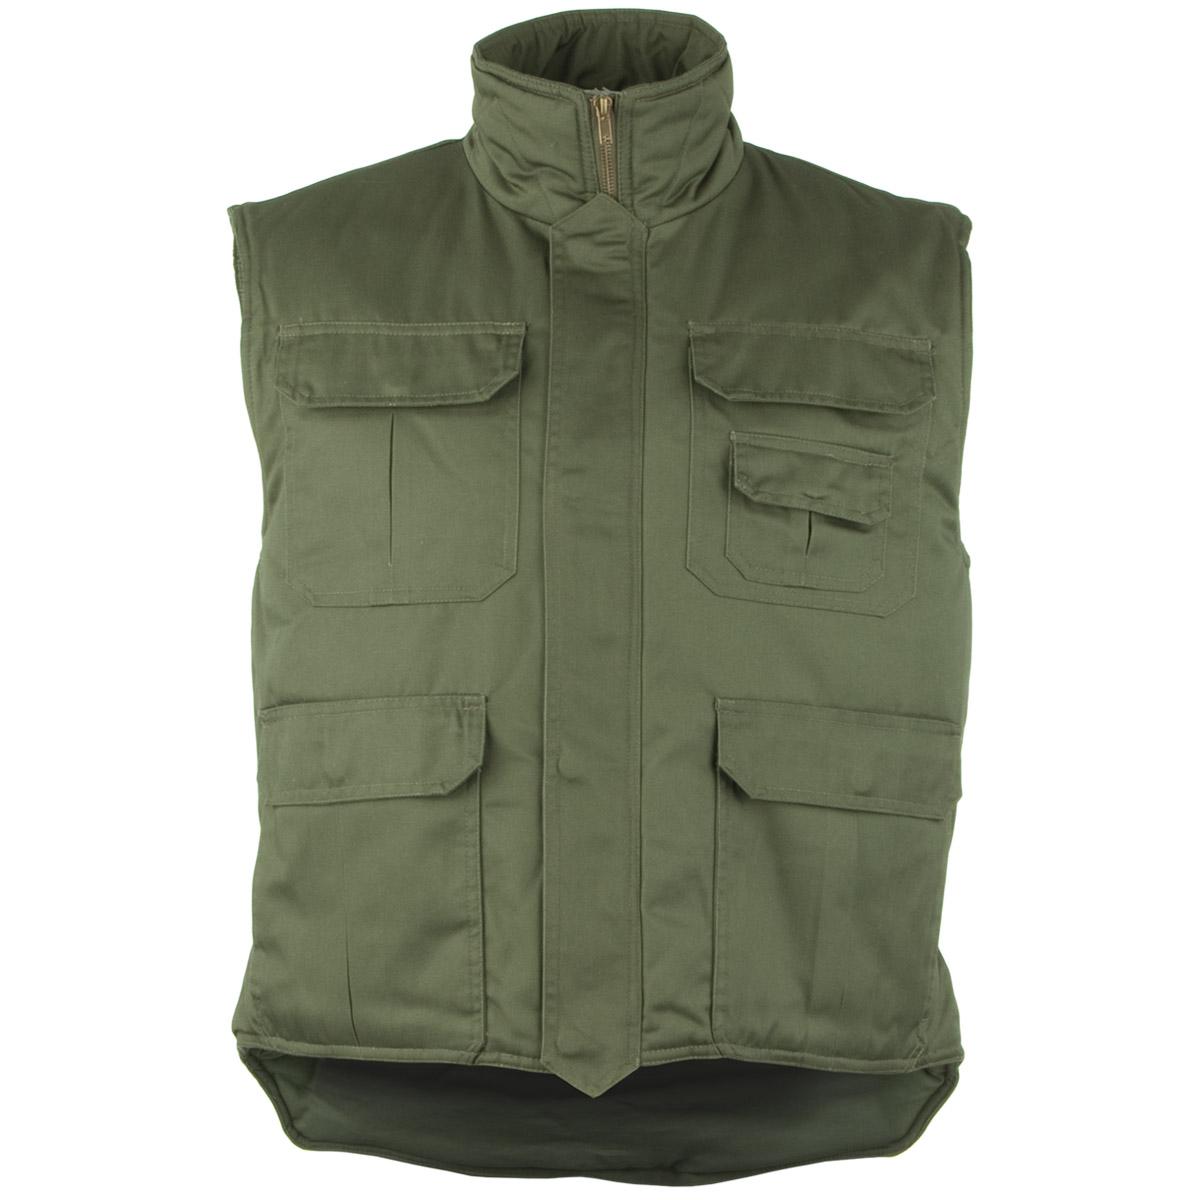 Army Body Warmer Padded Mens Vest Fishing Jacket Hunting